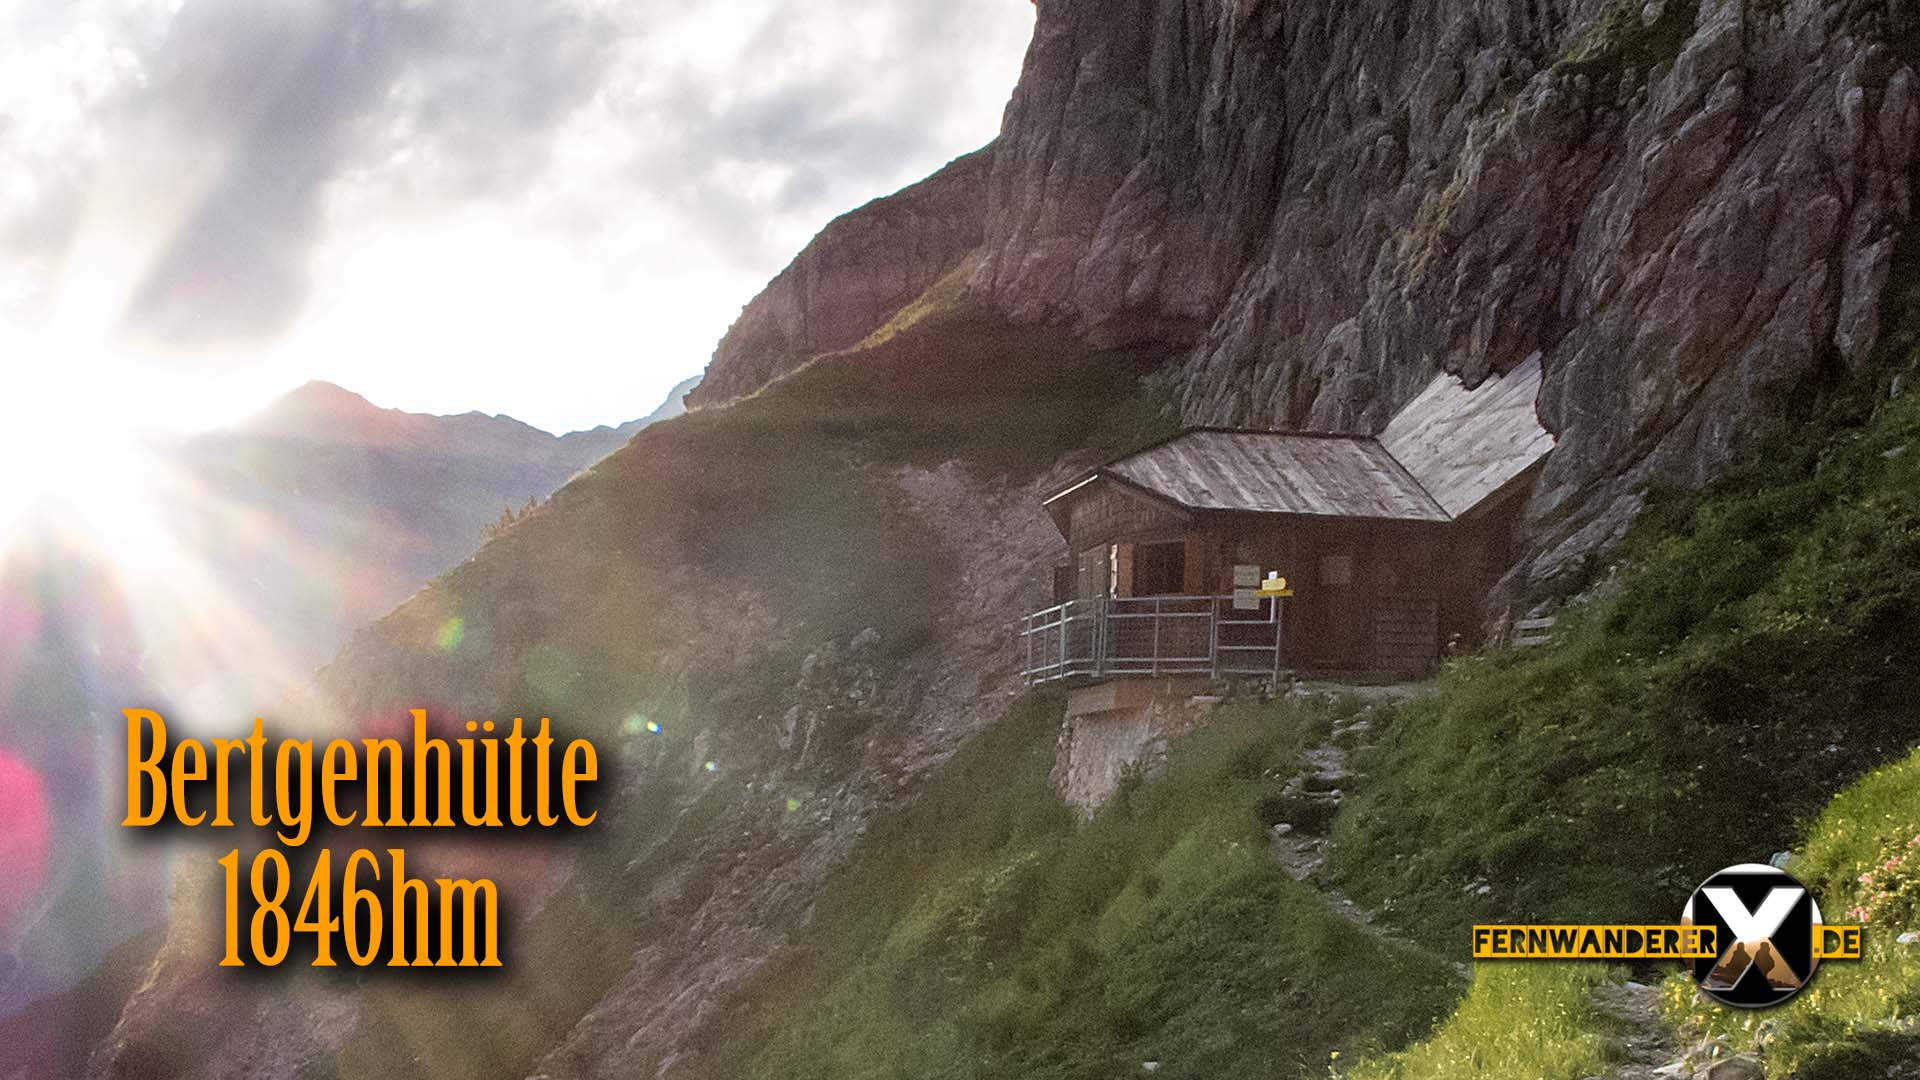 [:de]Bertgenhütte 1846hm - Hochseiler - Berchtesgadener Alpen[:en]Bertgenhütte 1846hm - Hochseiler - Berchtesgadener Alps[:]